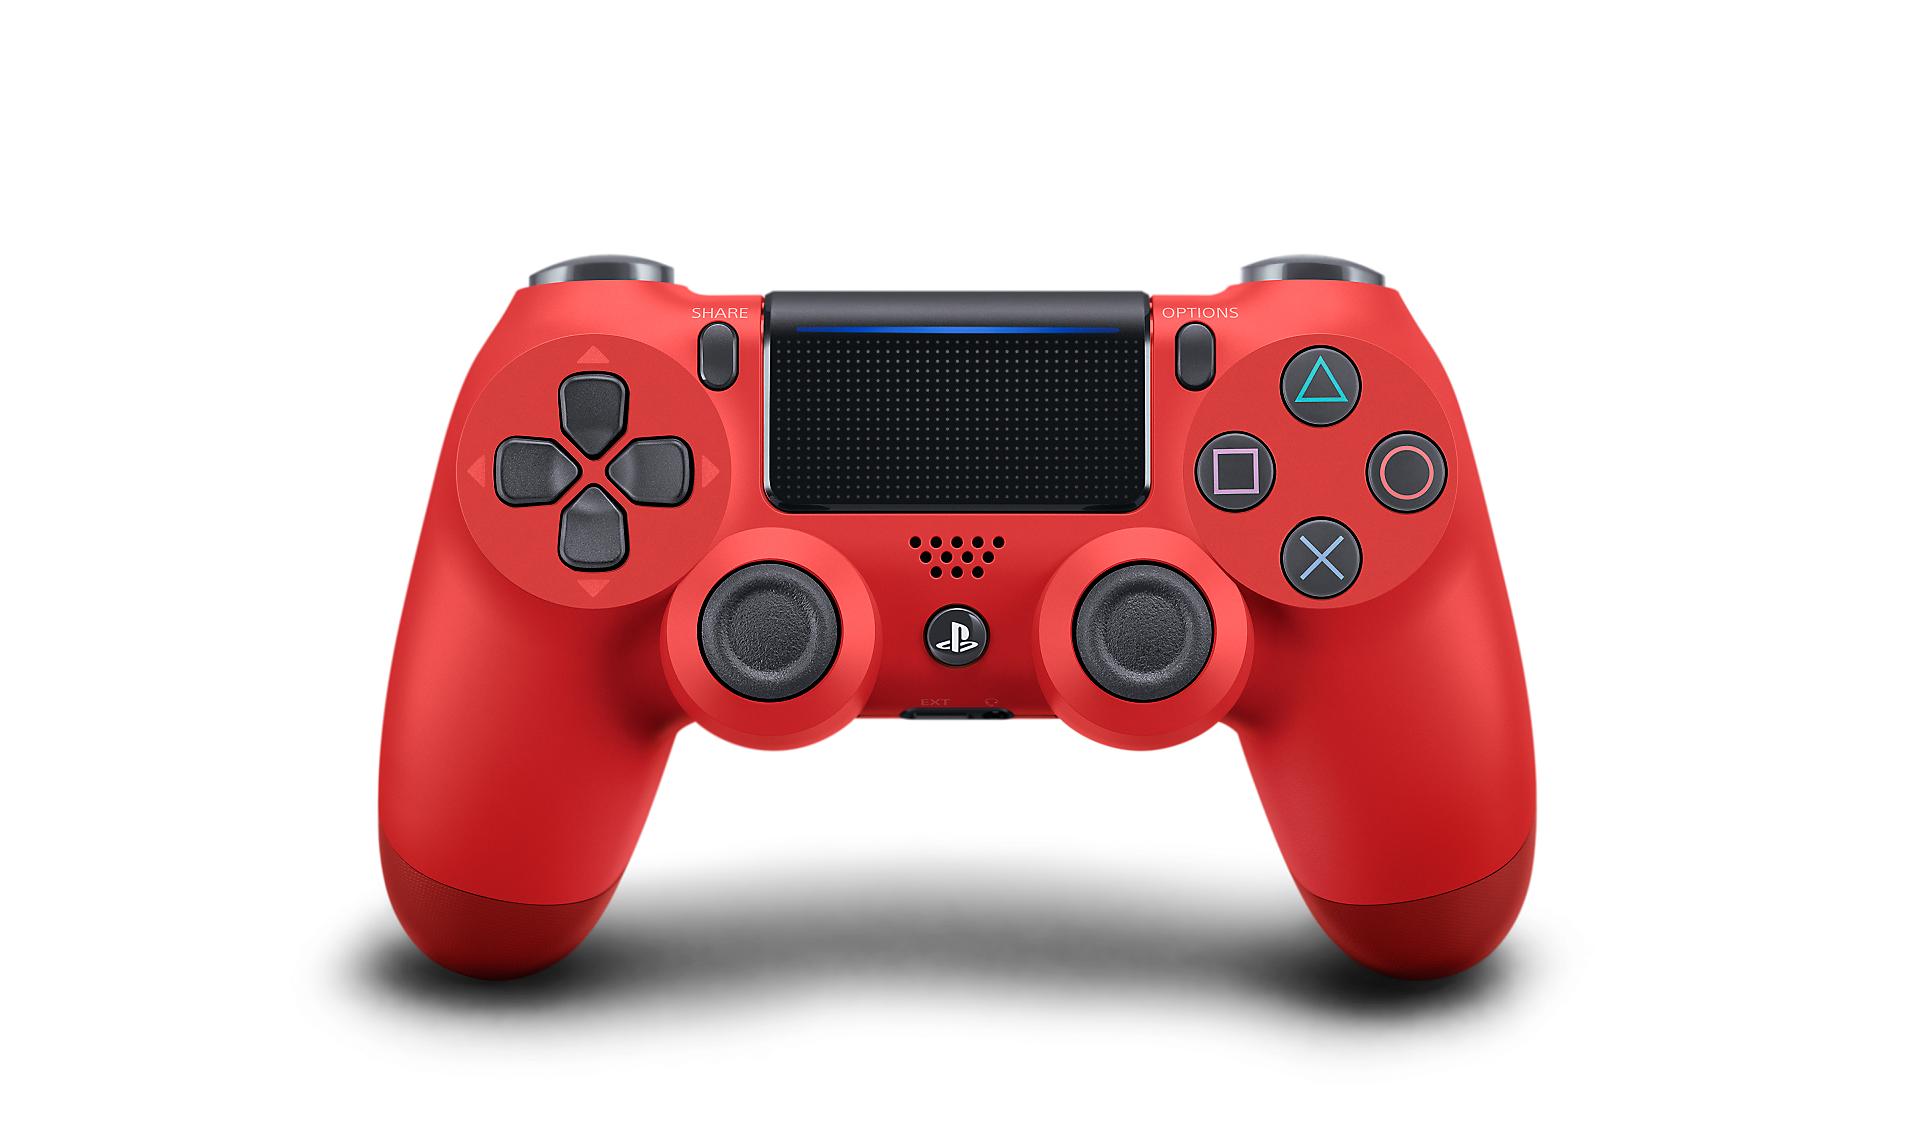 Dualshock 4 Playstation